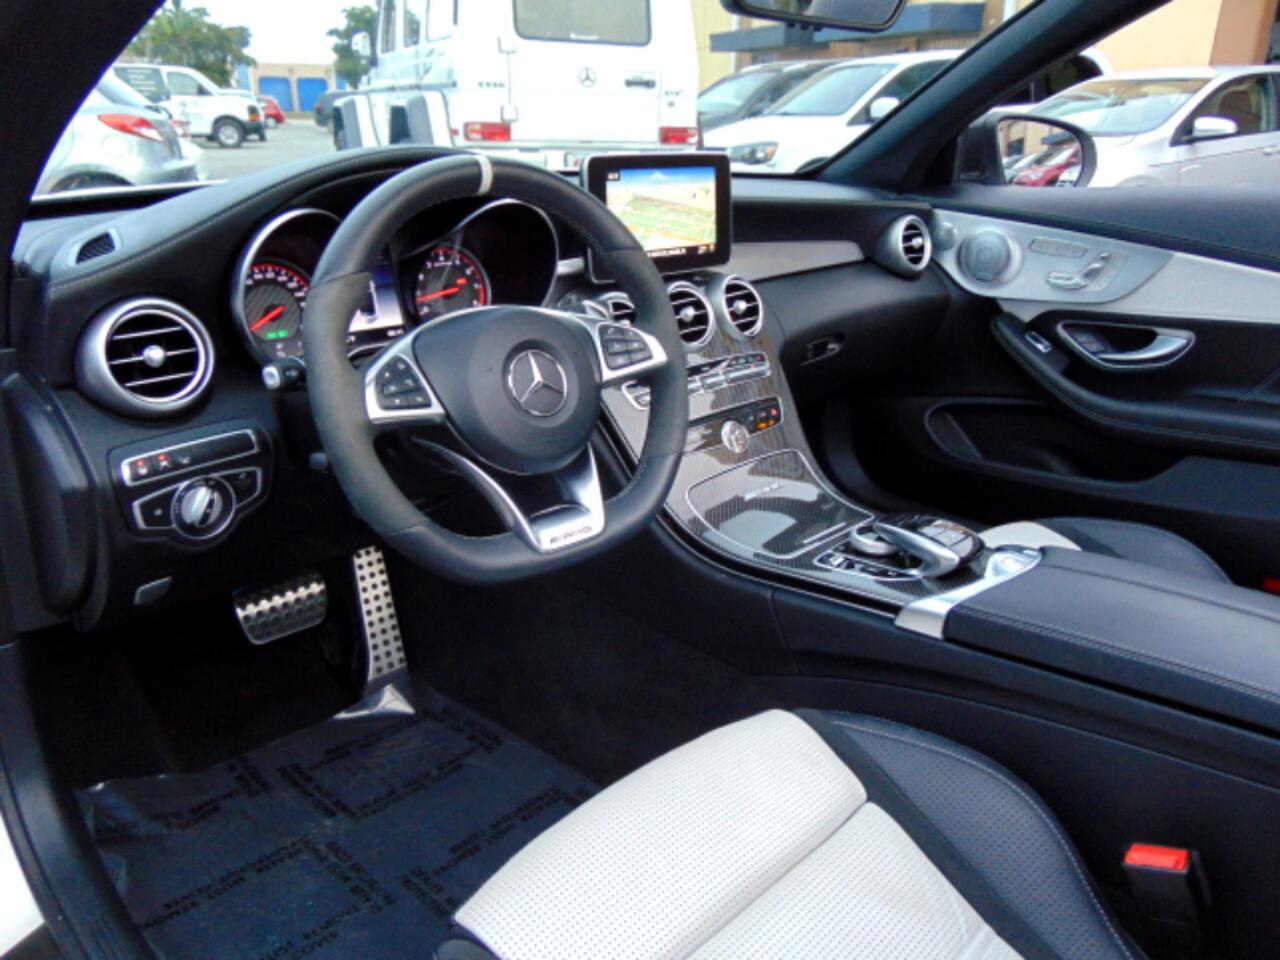 2018 Mercedes-Benz C-Class AMG C 63 S Cabriolet